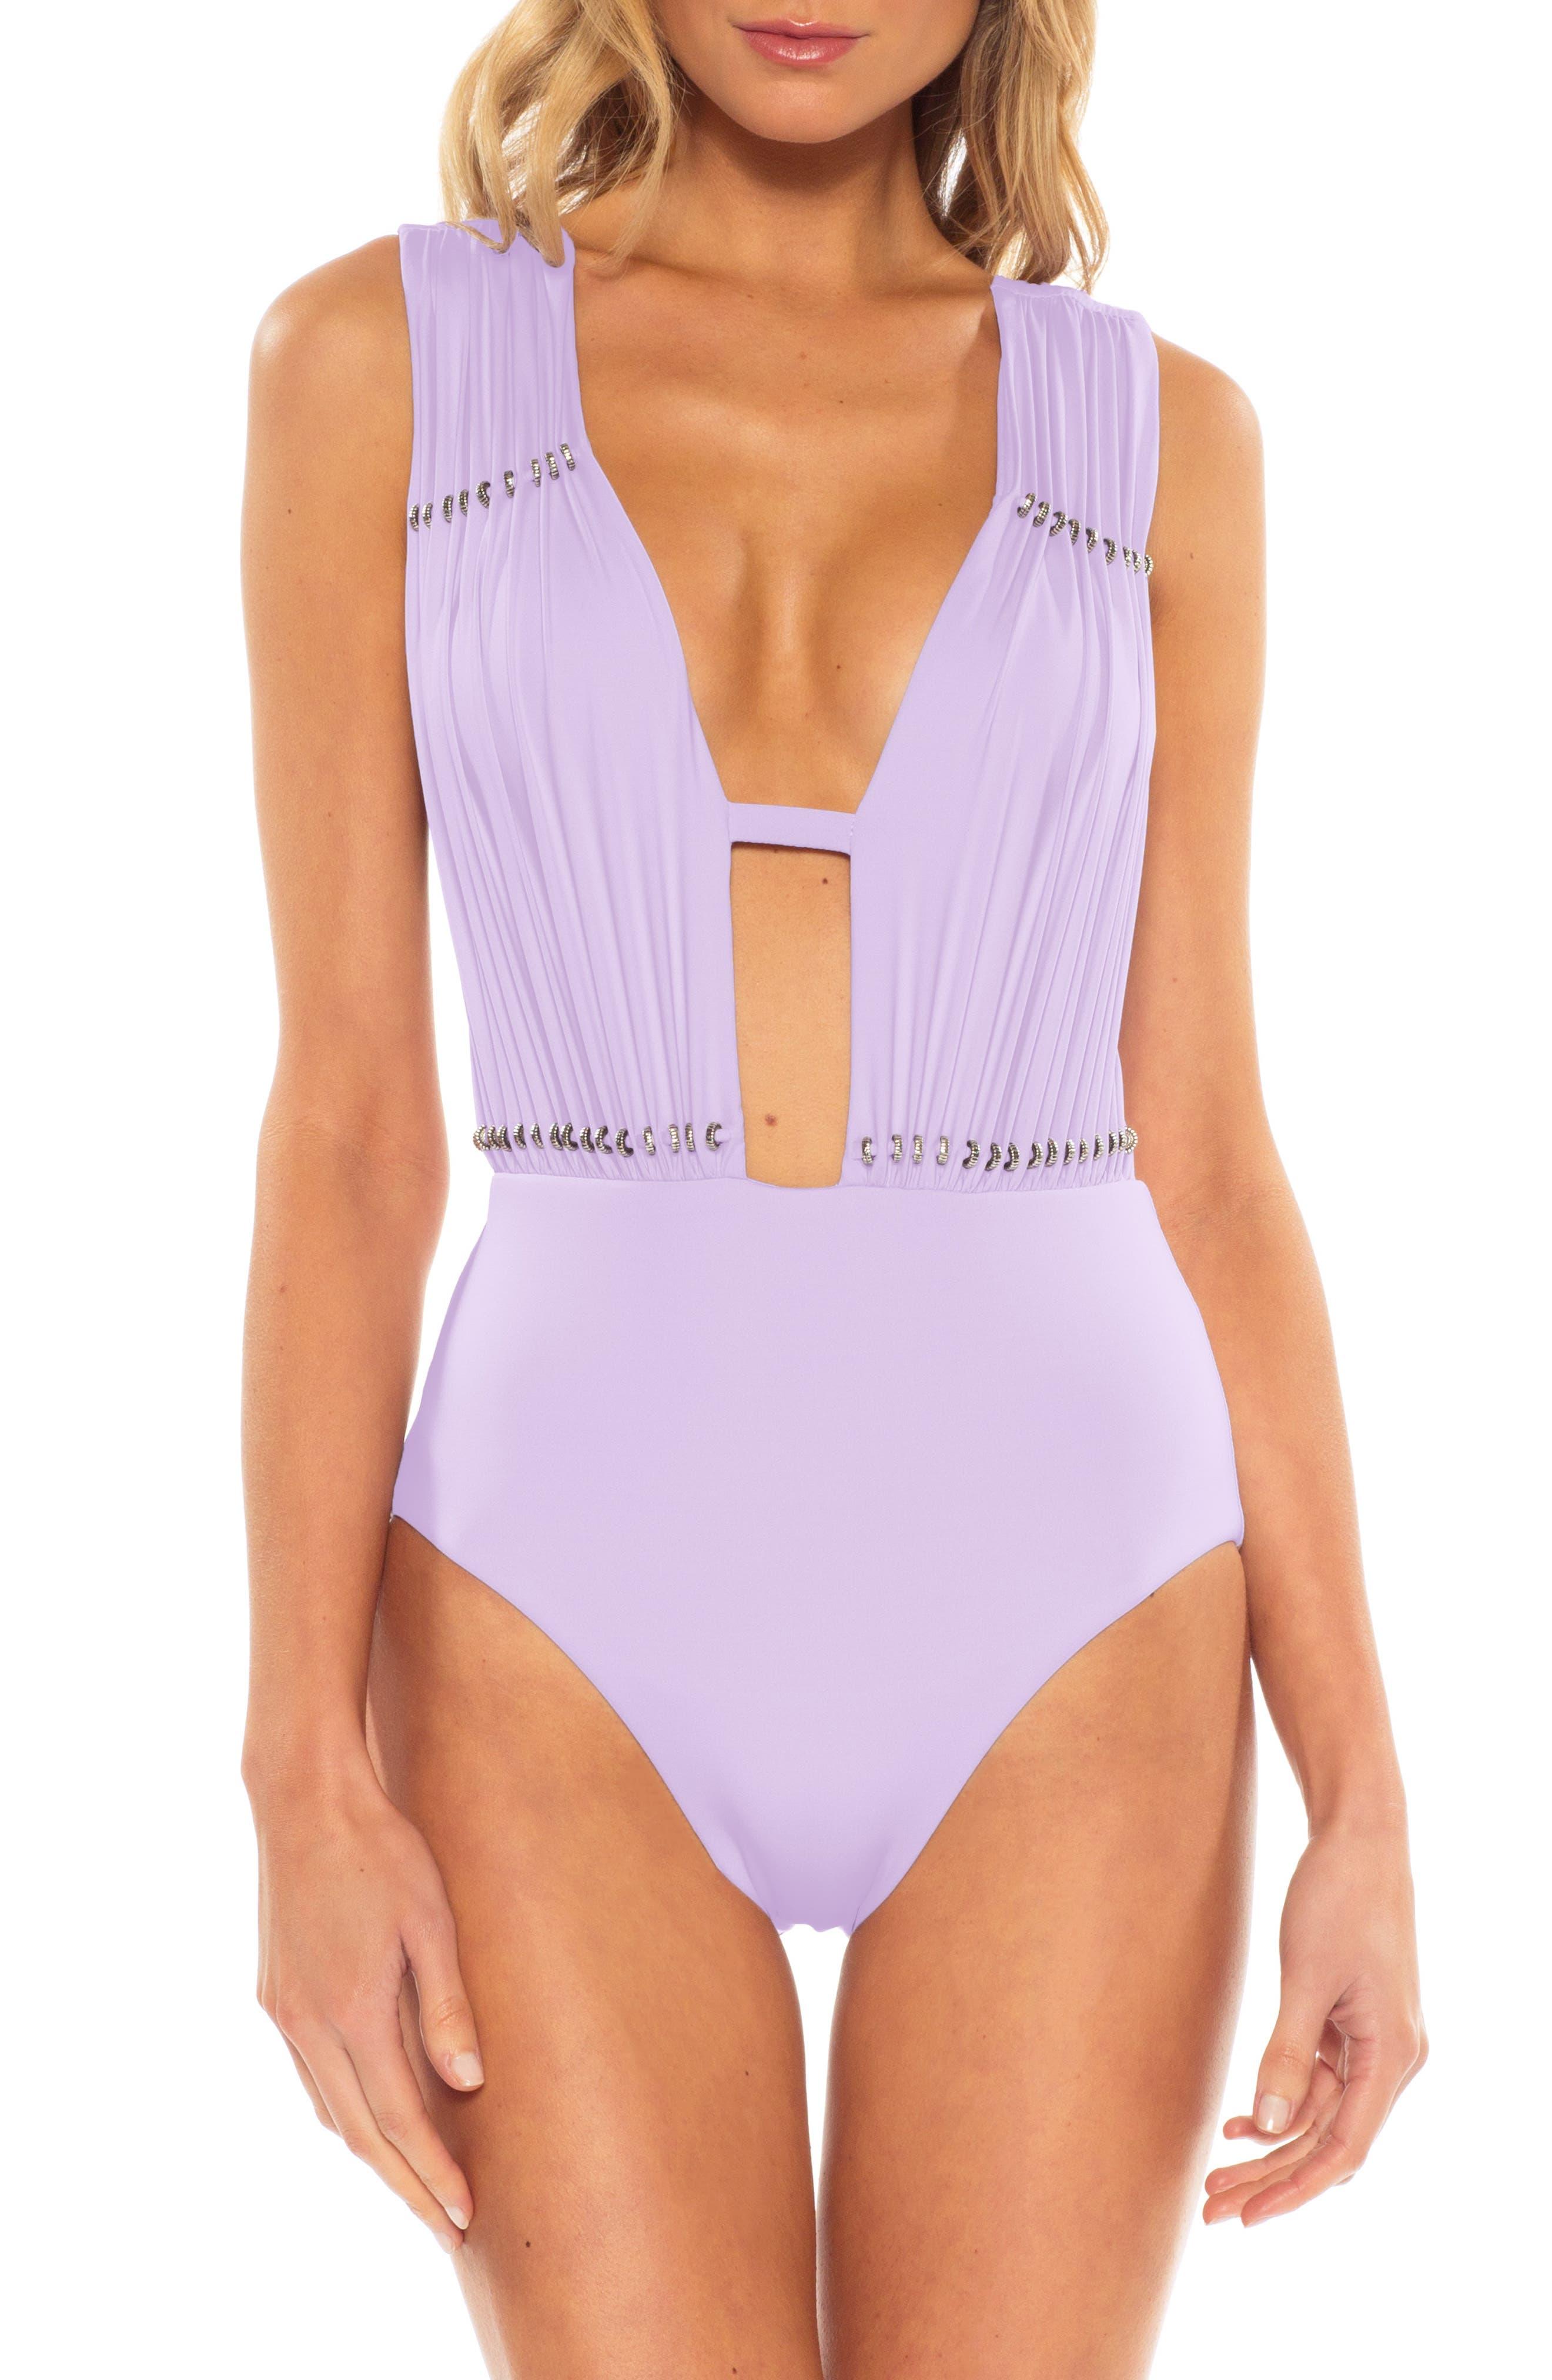 Becca Reconnect One-Piece Swimsuit, Purple